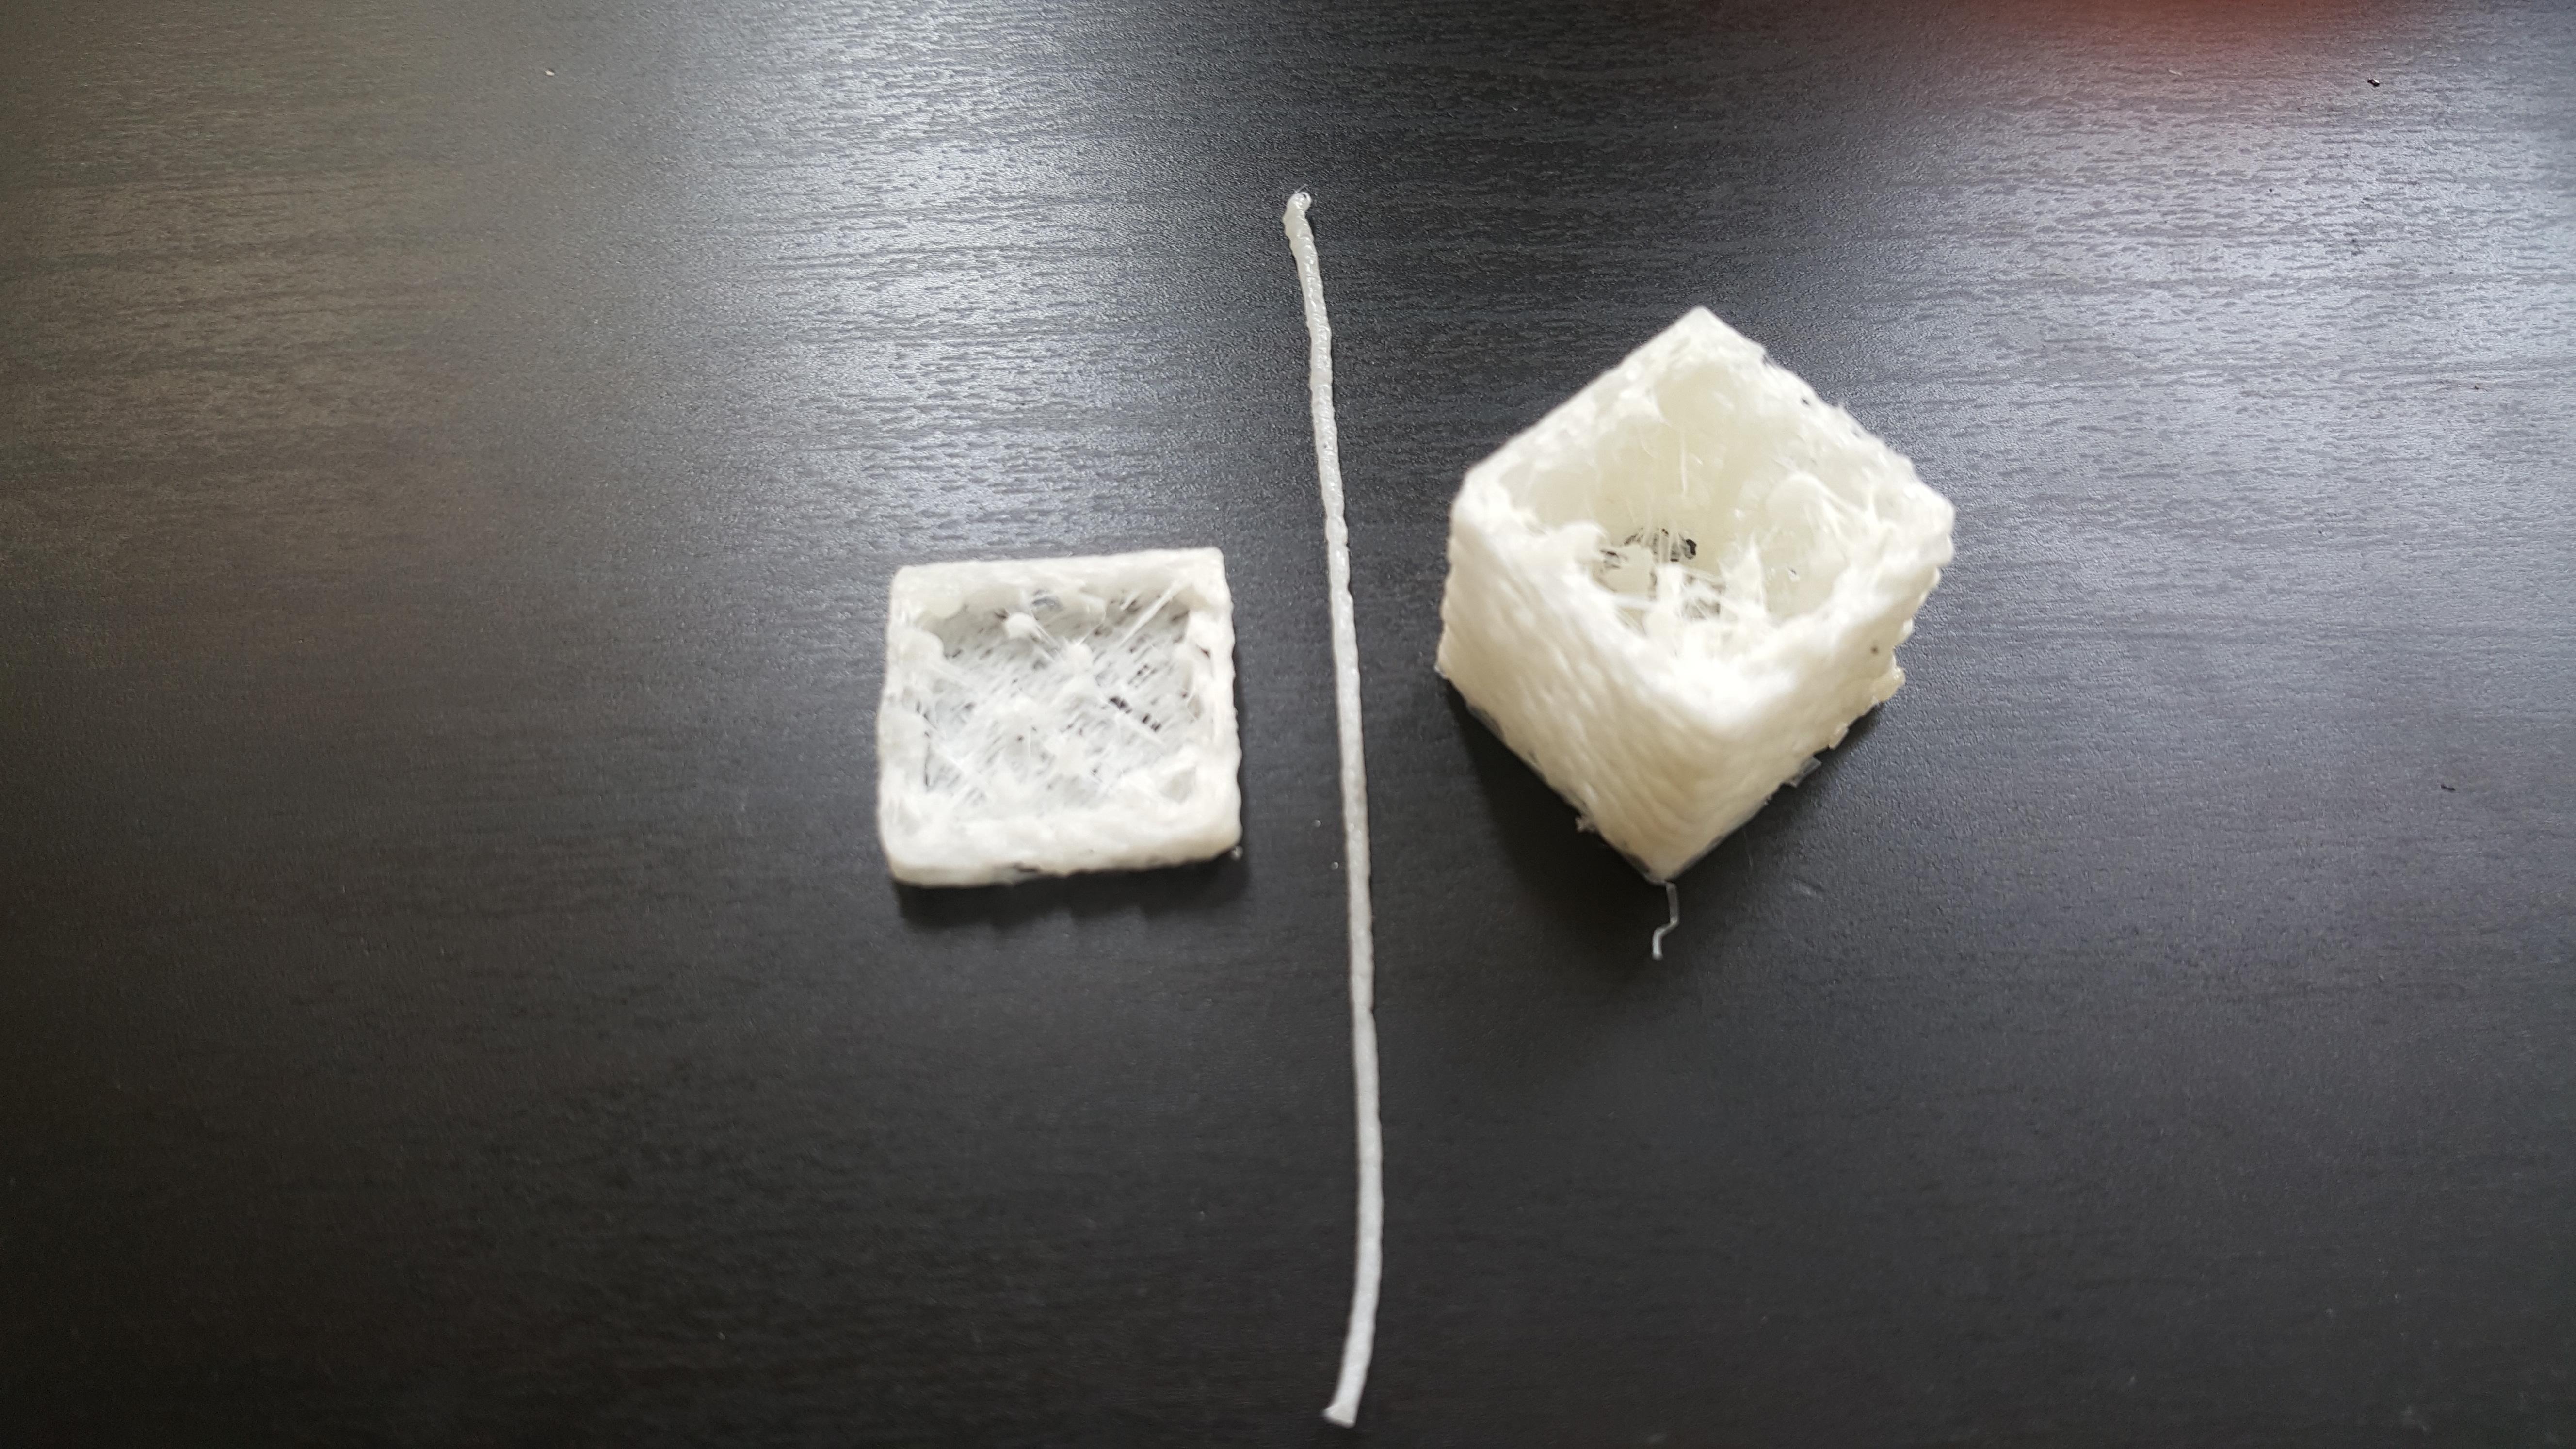 DaVinci 1 0A wont extrude consistent (SOLVED) - 3D Printing / 3D